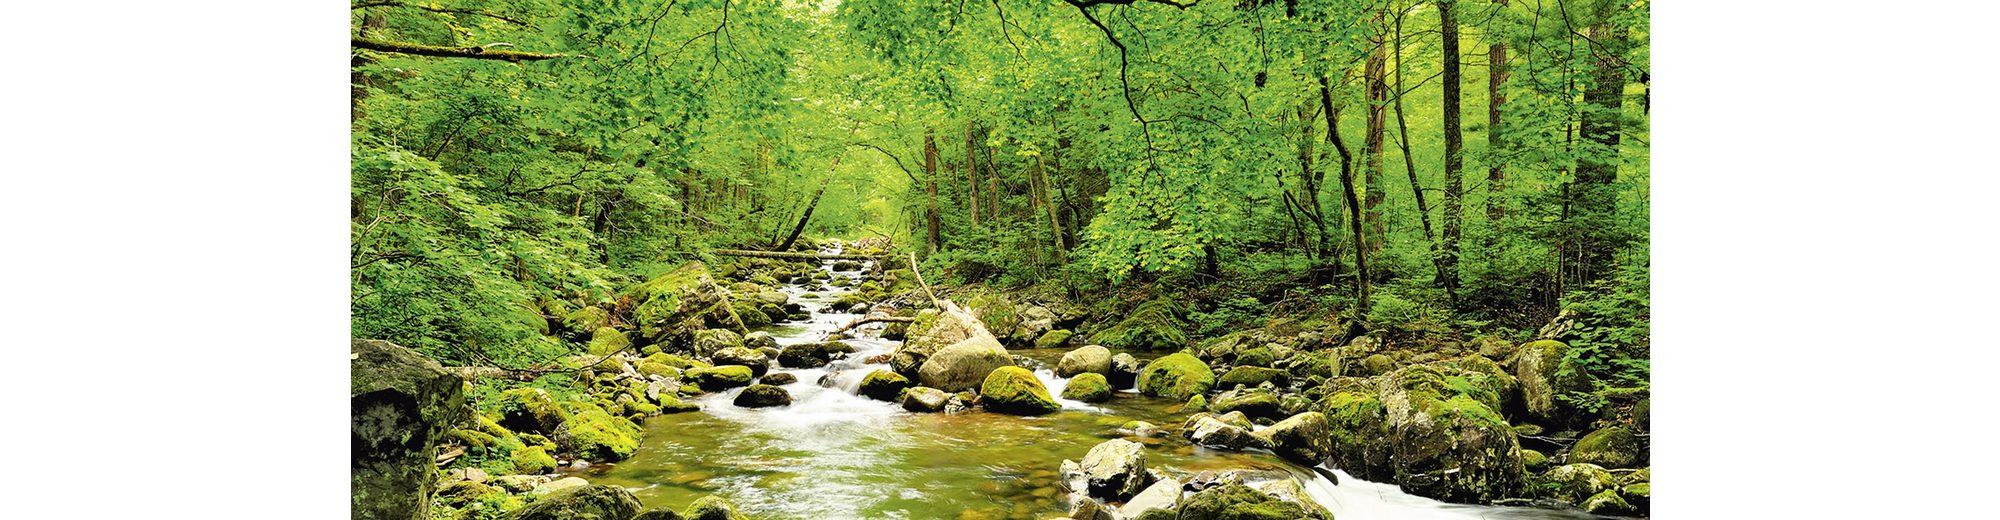 Glasbild, Home affaire, »tupikov: Herbstwald, Fluß Smolny«, 125/50 cm